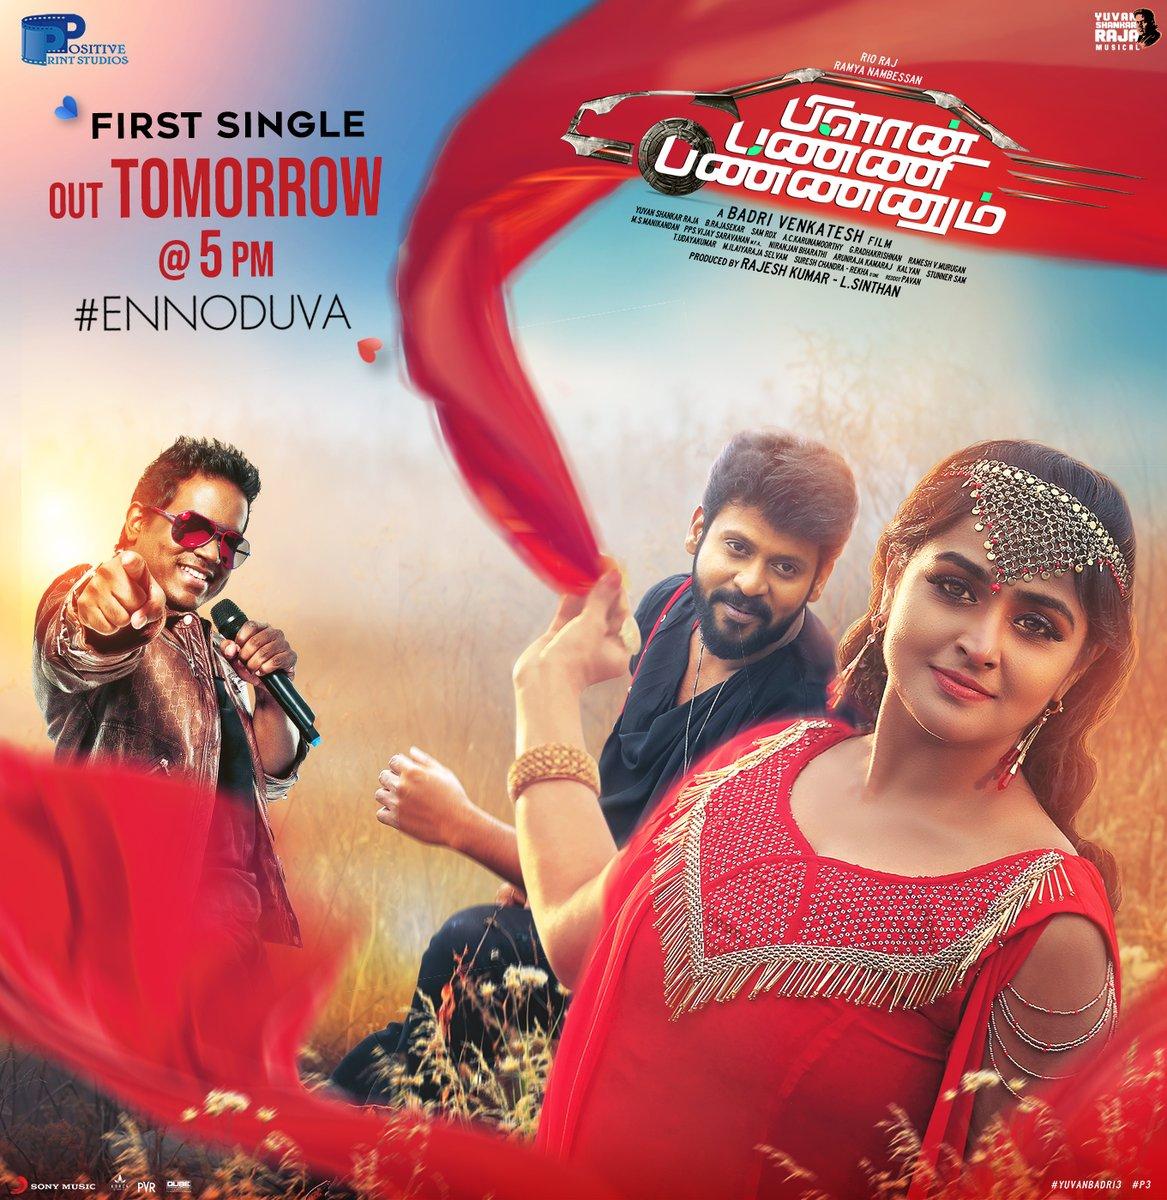 A romantic number by our U1, on its way to mesmerize you!🥰  #Ennoduva - First single from #PlanPanniPannanum releasing tomorrow at 5 pm!  #P3 #YuvanBadri3 @rio_raj @nambessan_ramya @dirbadri @thisisysr @SinthanL @Rajeshnvc5Kumar @DopRajasekarB @imroboshankar @Bala_actor